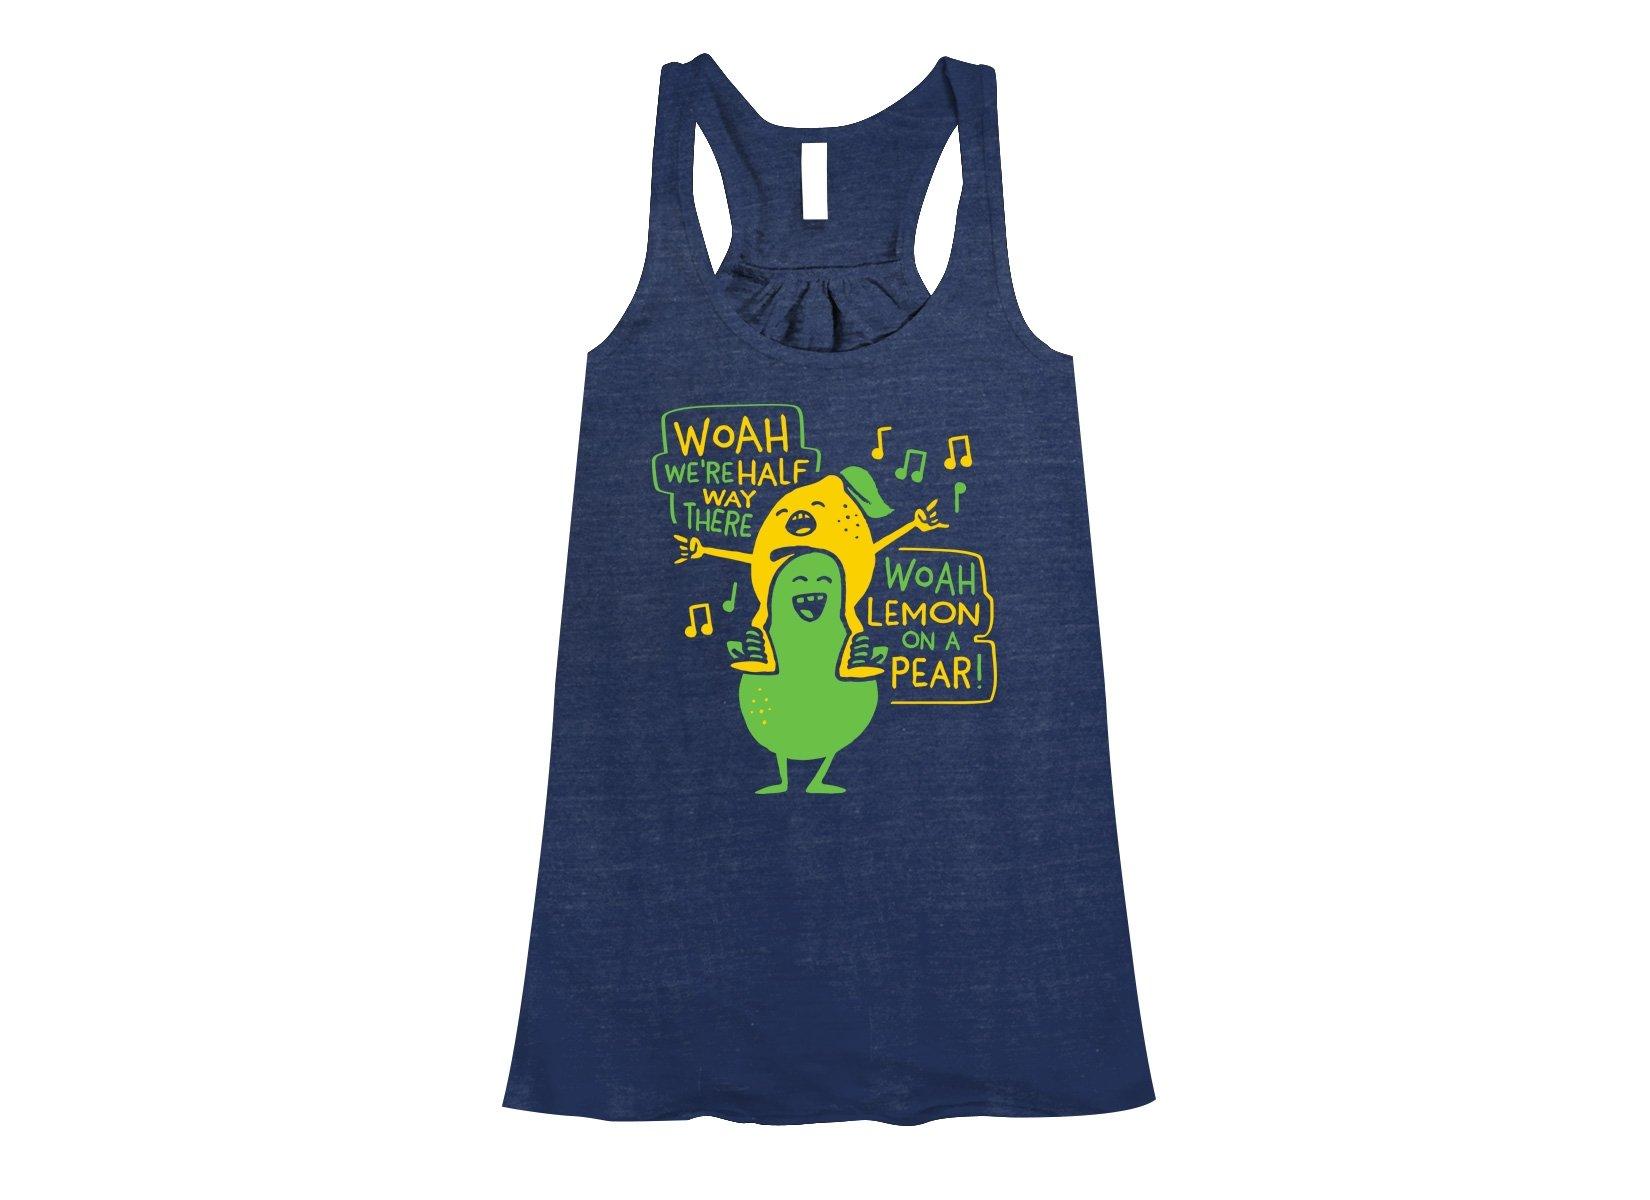 Lemon On A Pear on Womens Tanks T-Shirt